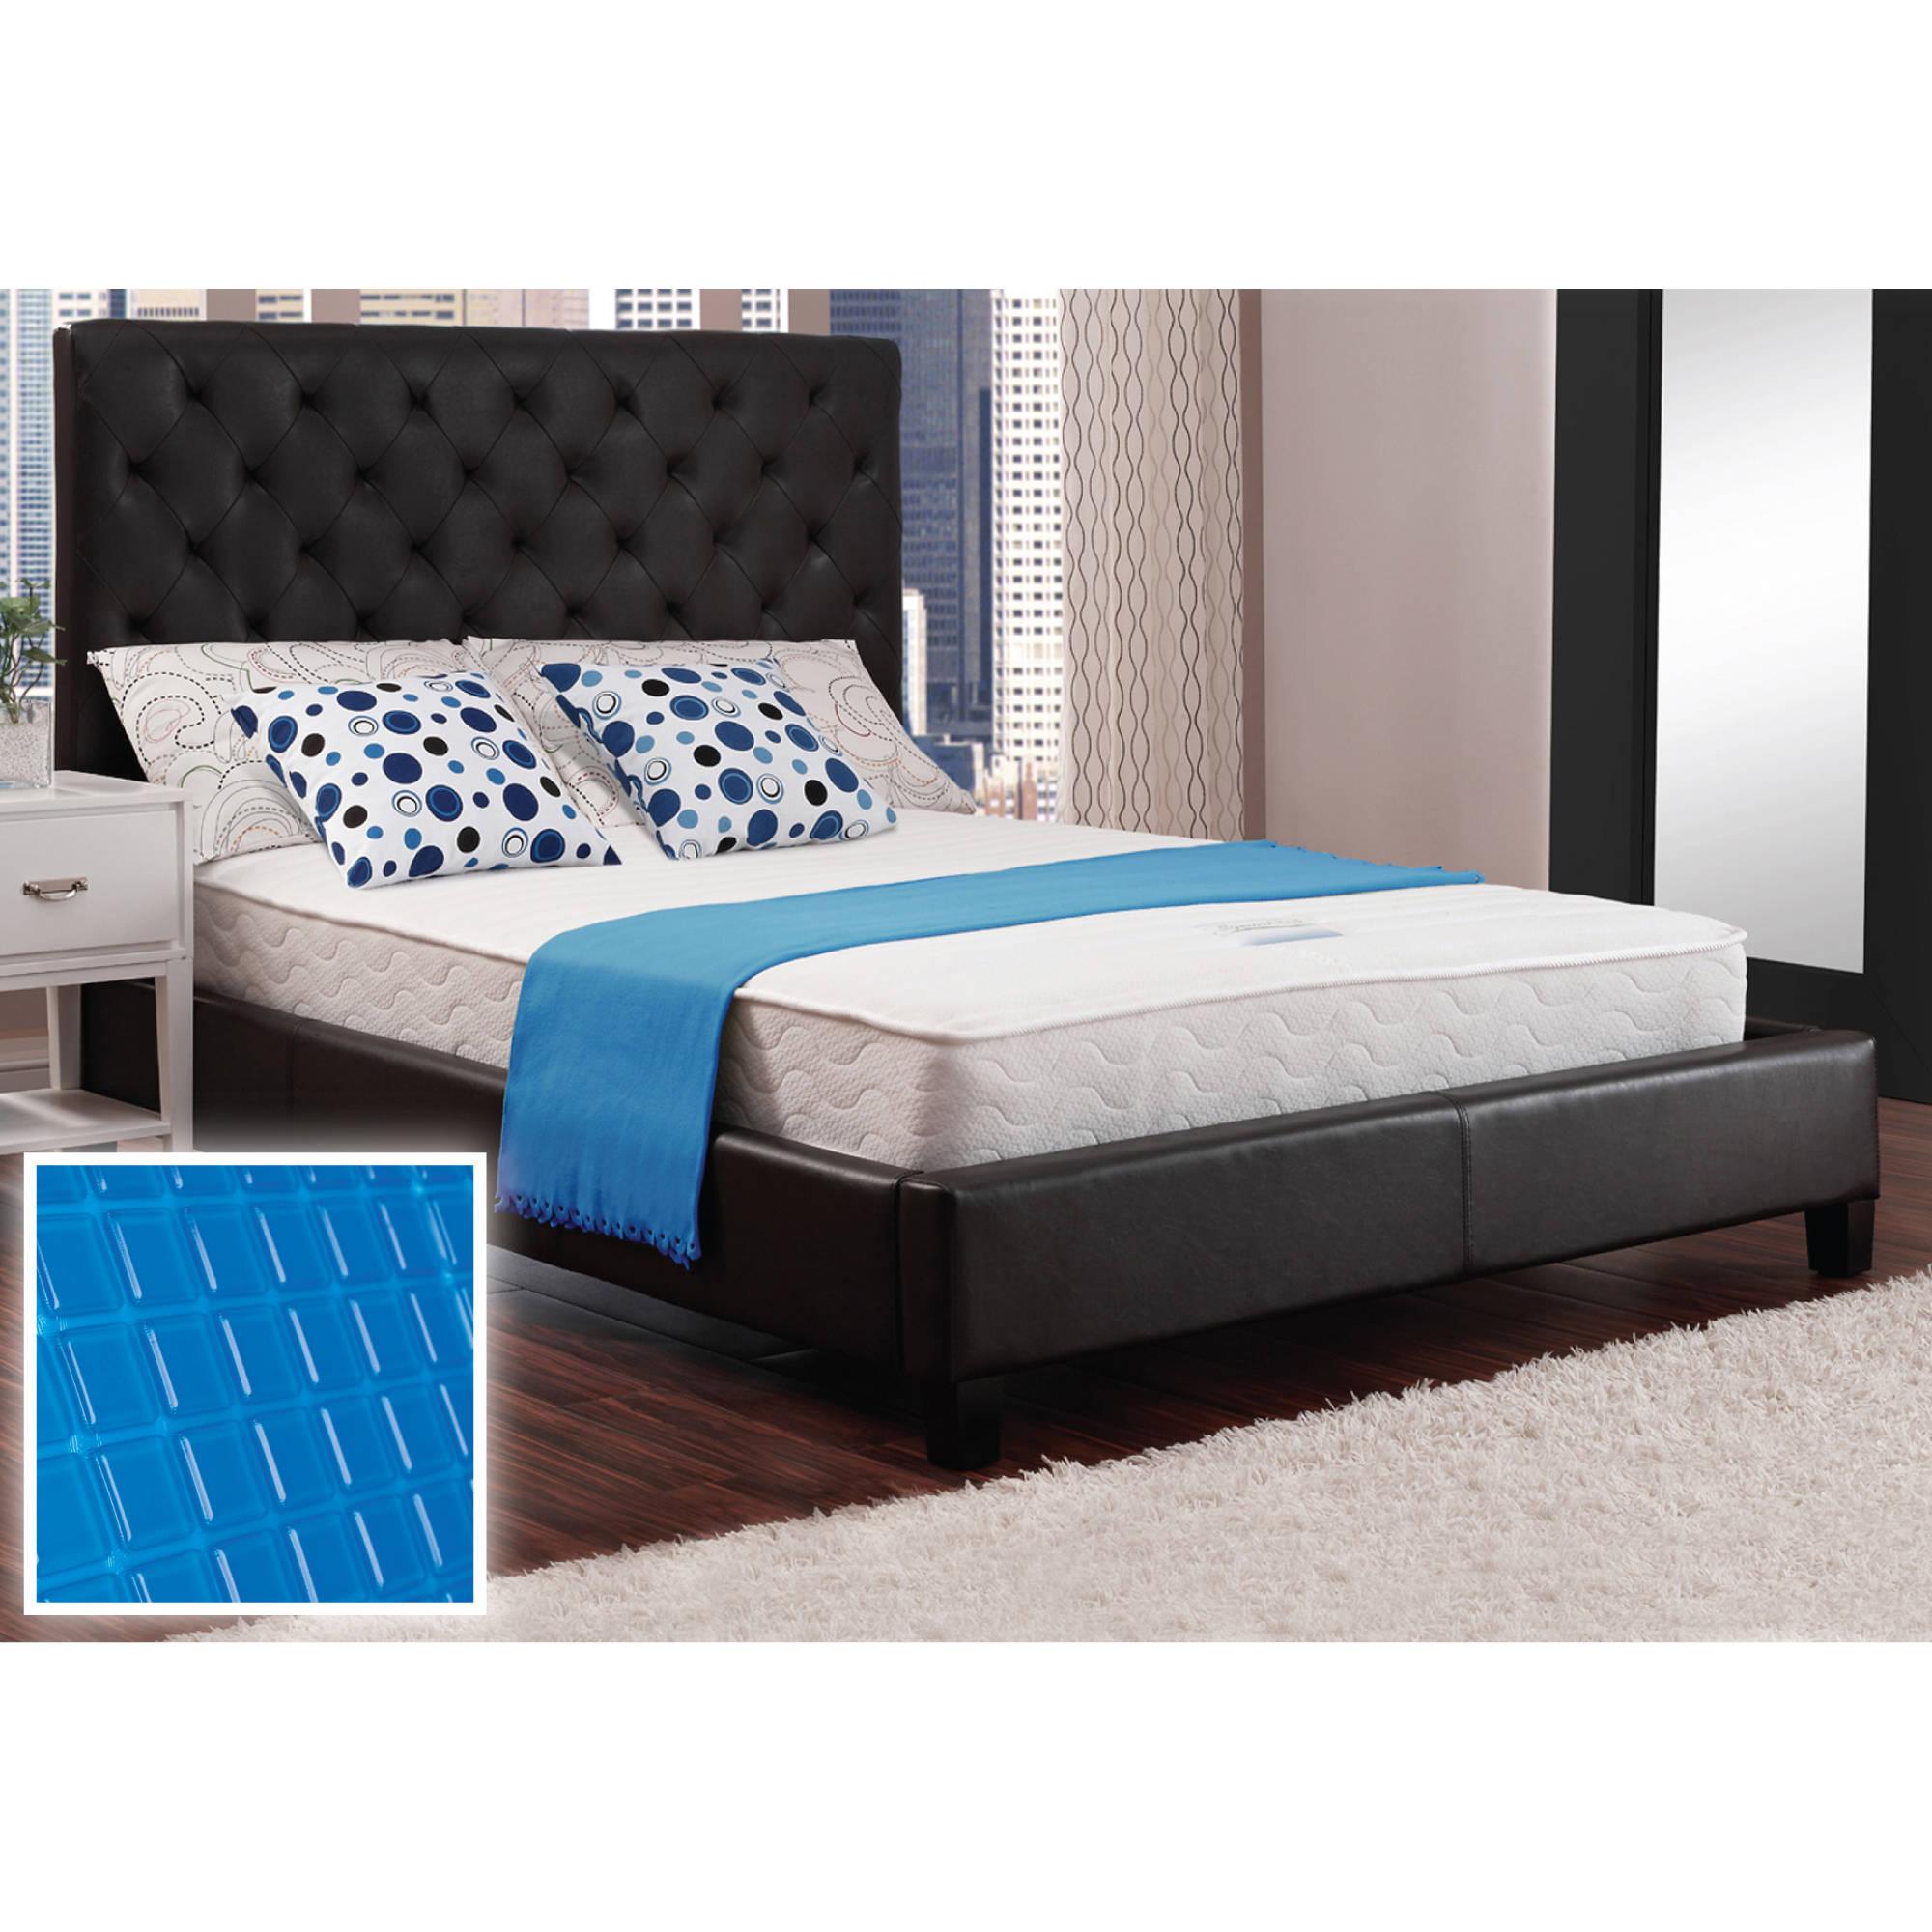 "Signature Sleep 8"" Hybrid RenewGel / Coil Mattress; Twin"